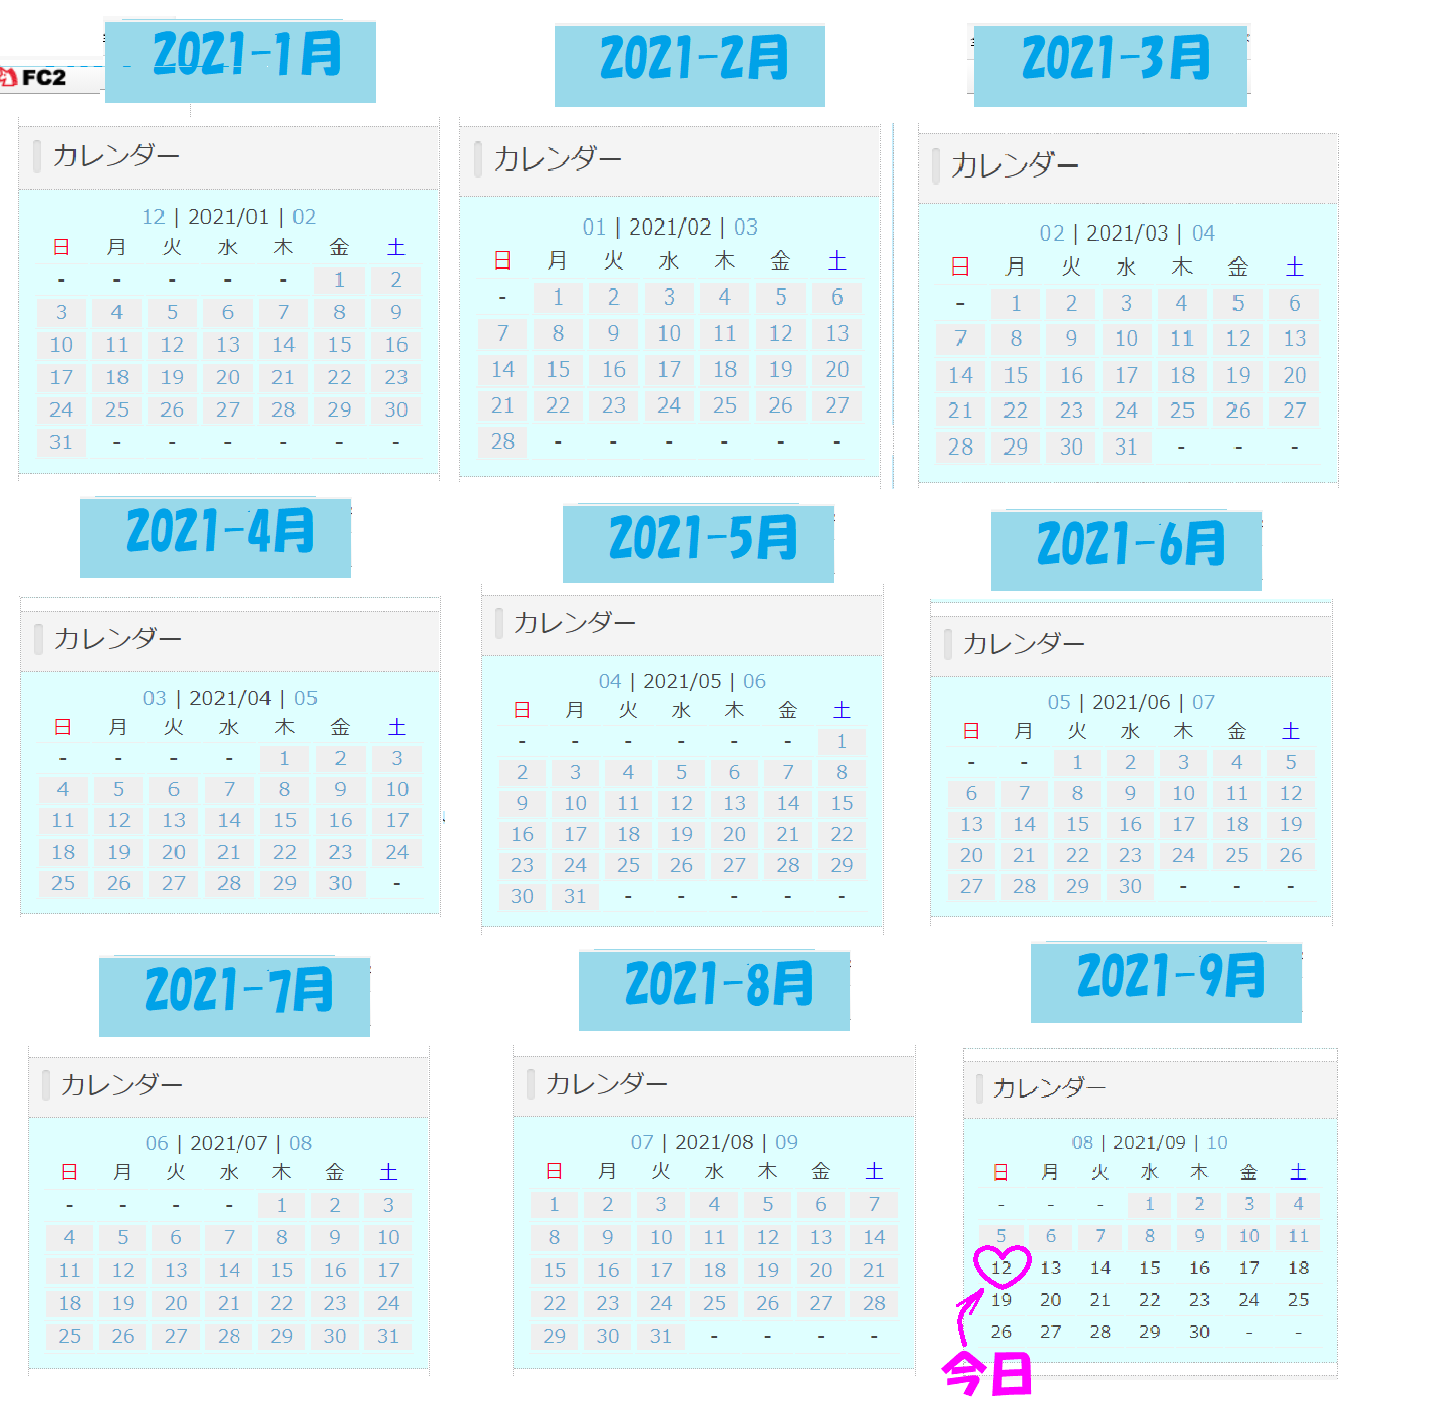 2021-1月-9月-2